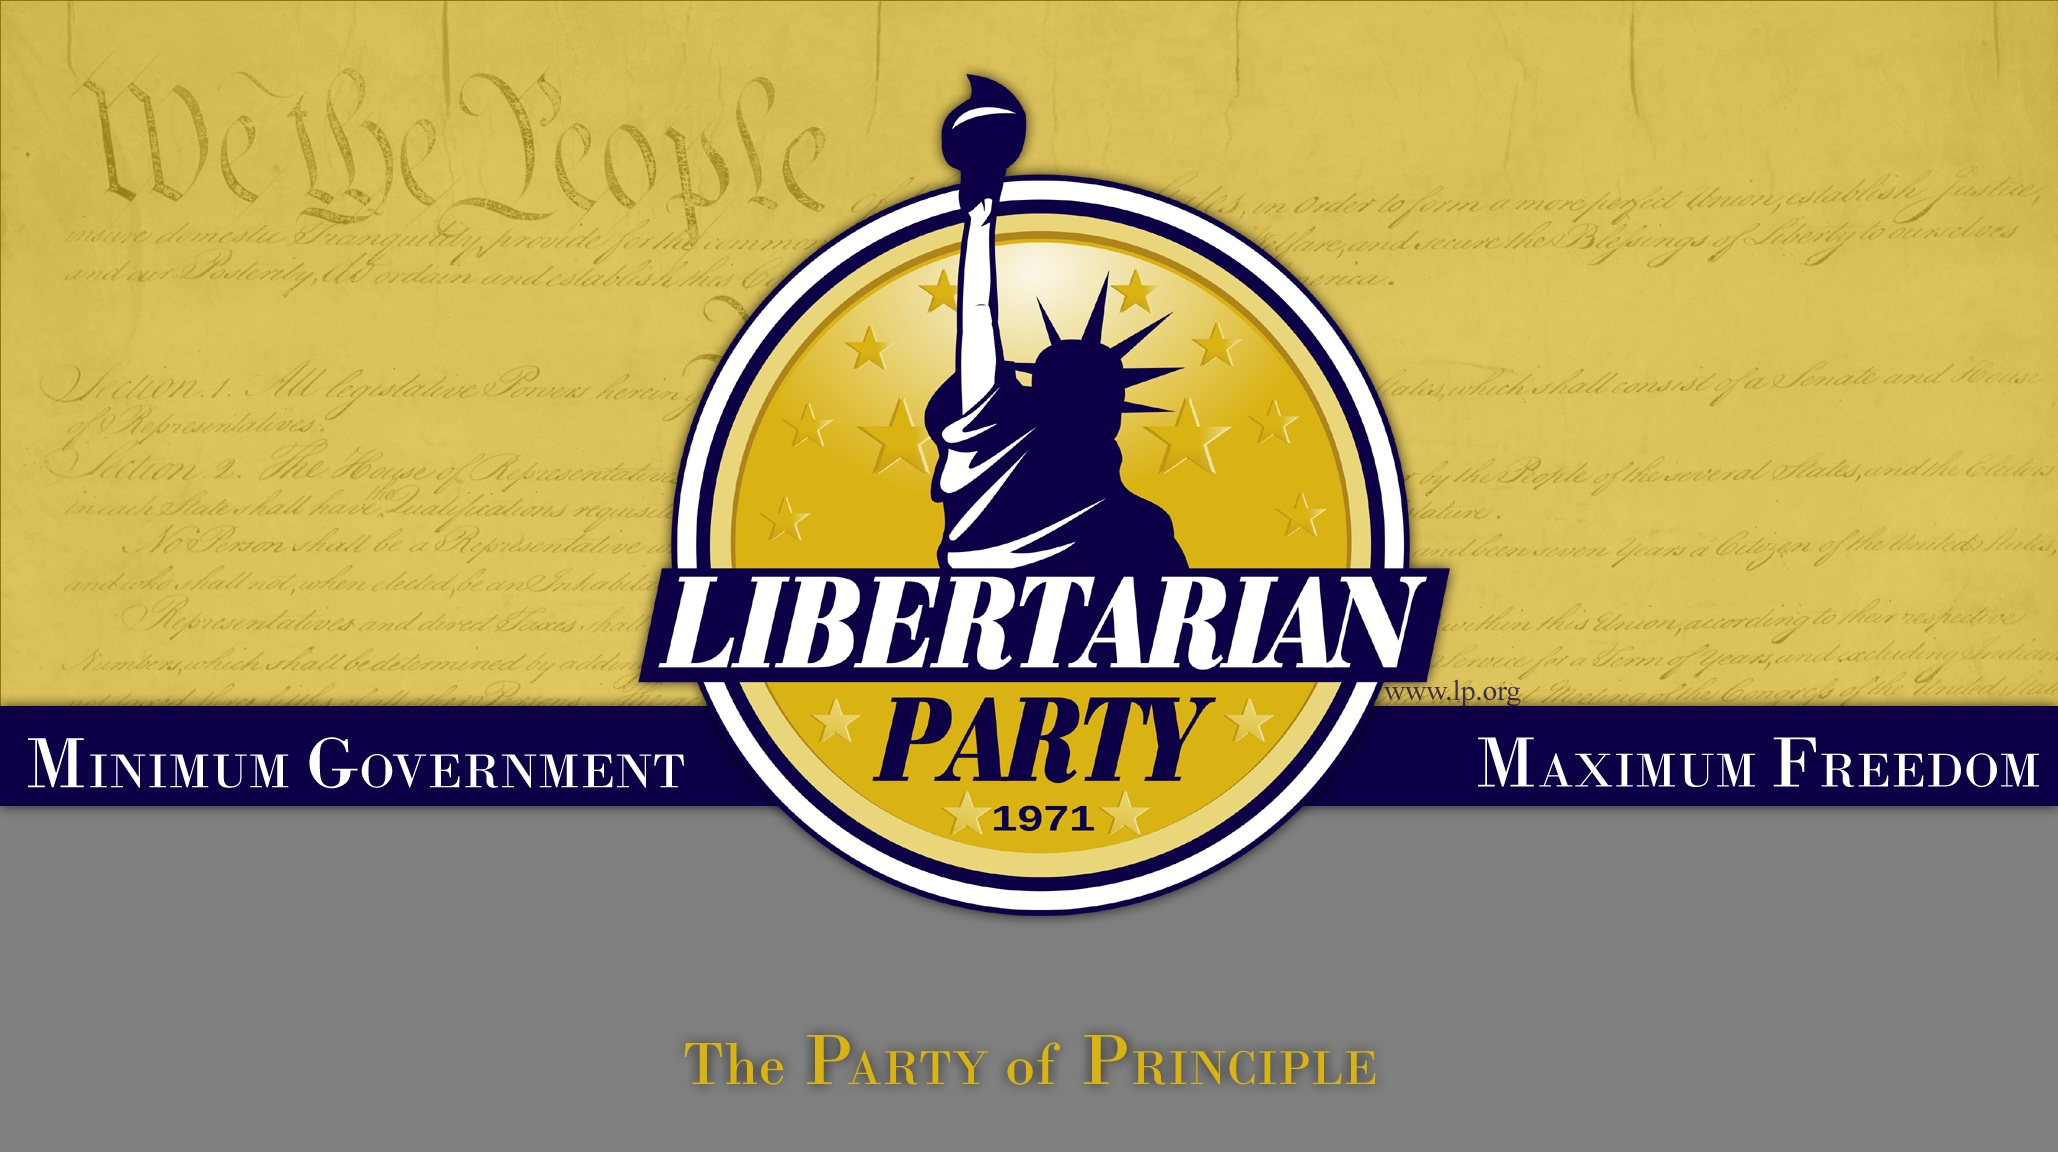 libertarian wallpaper - photo #11